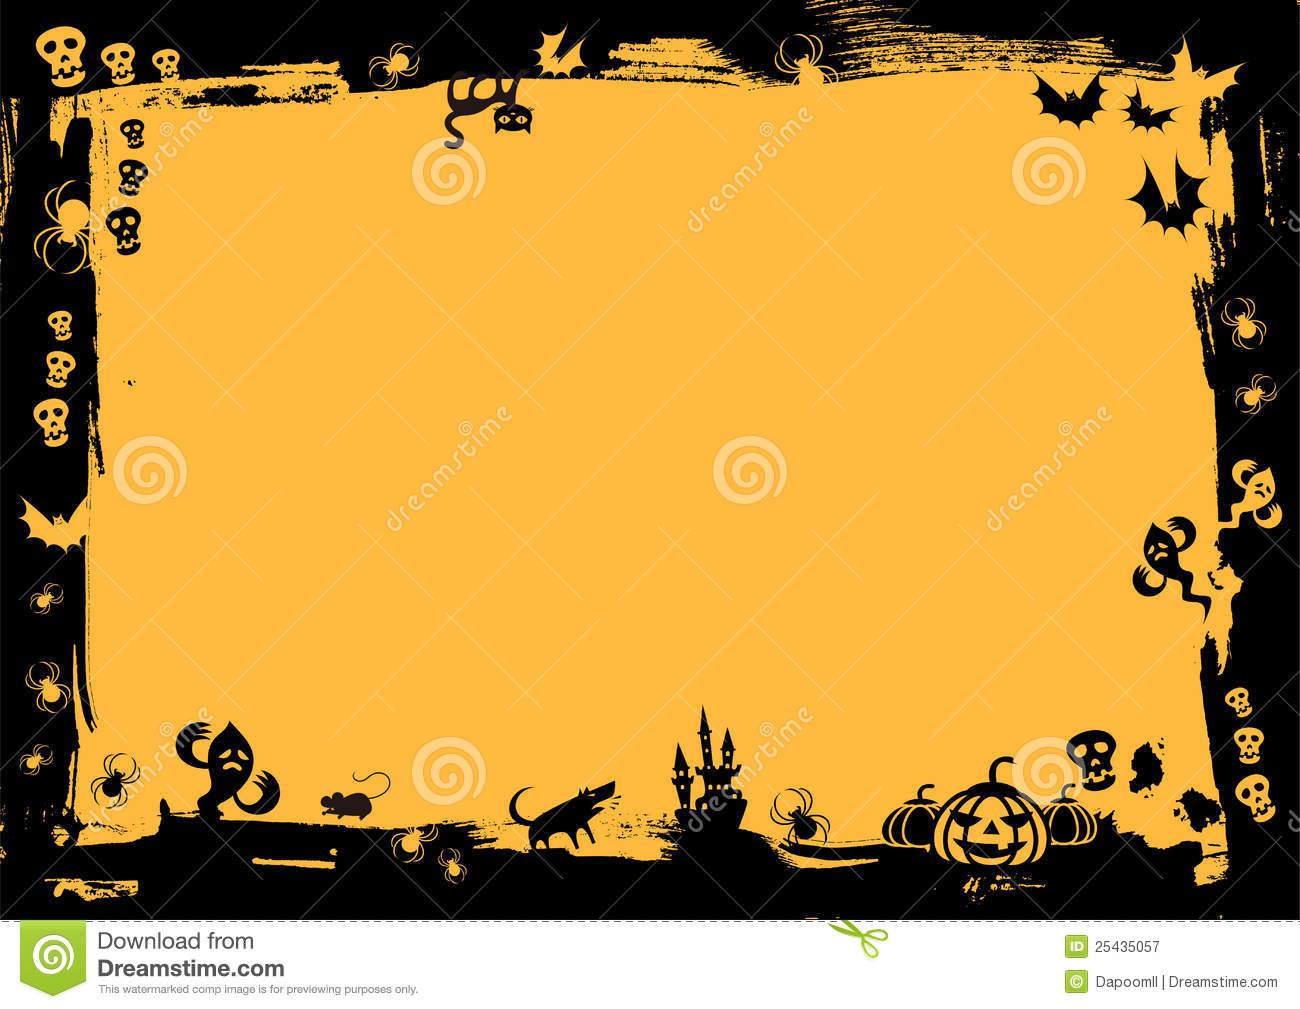 1300x1009 Halloween Wallpaper Borders Fun For Christmas